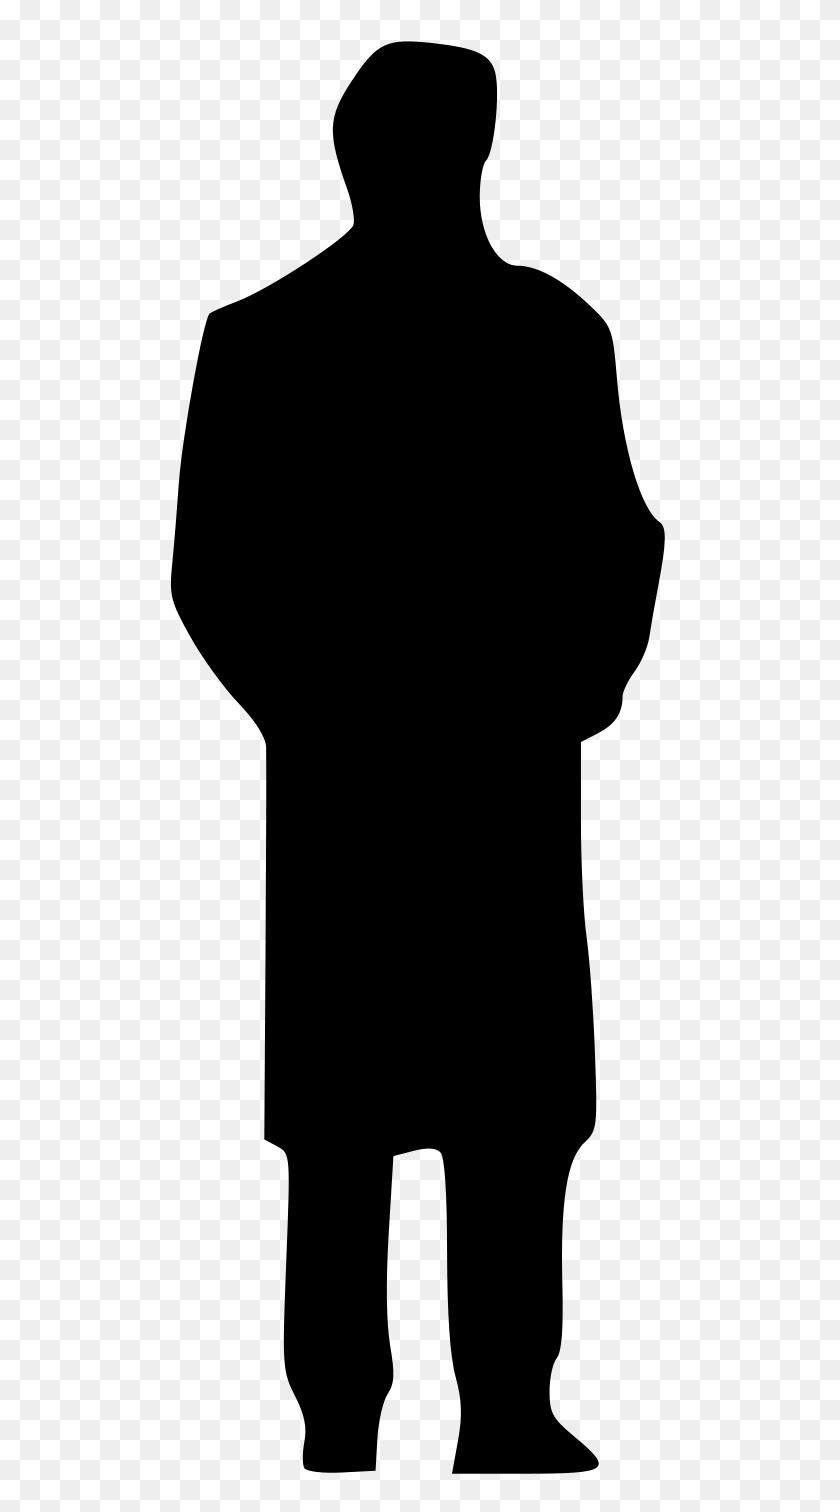 medium resolution of scientist clipart old man scuba diver silhouette clip art